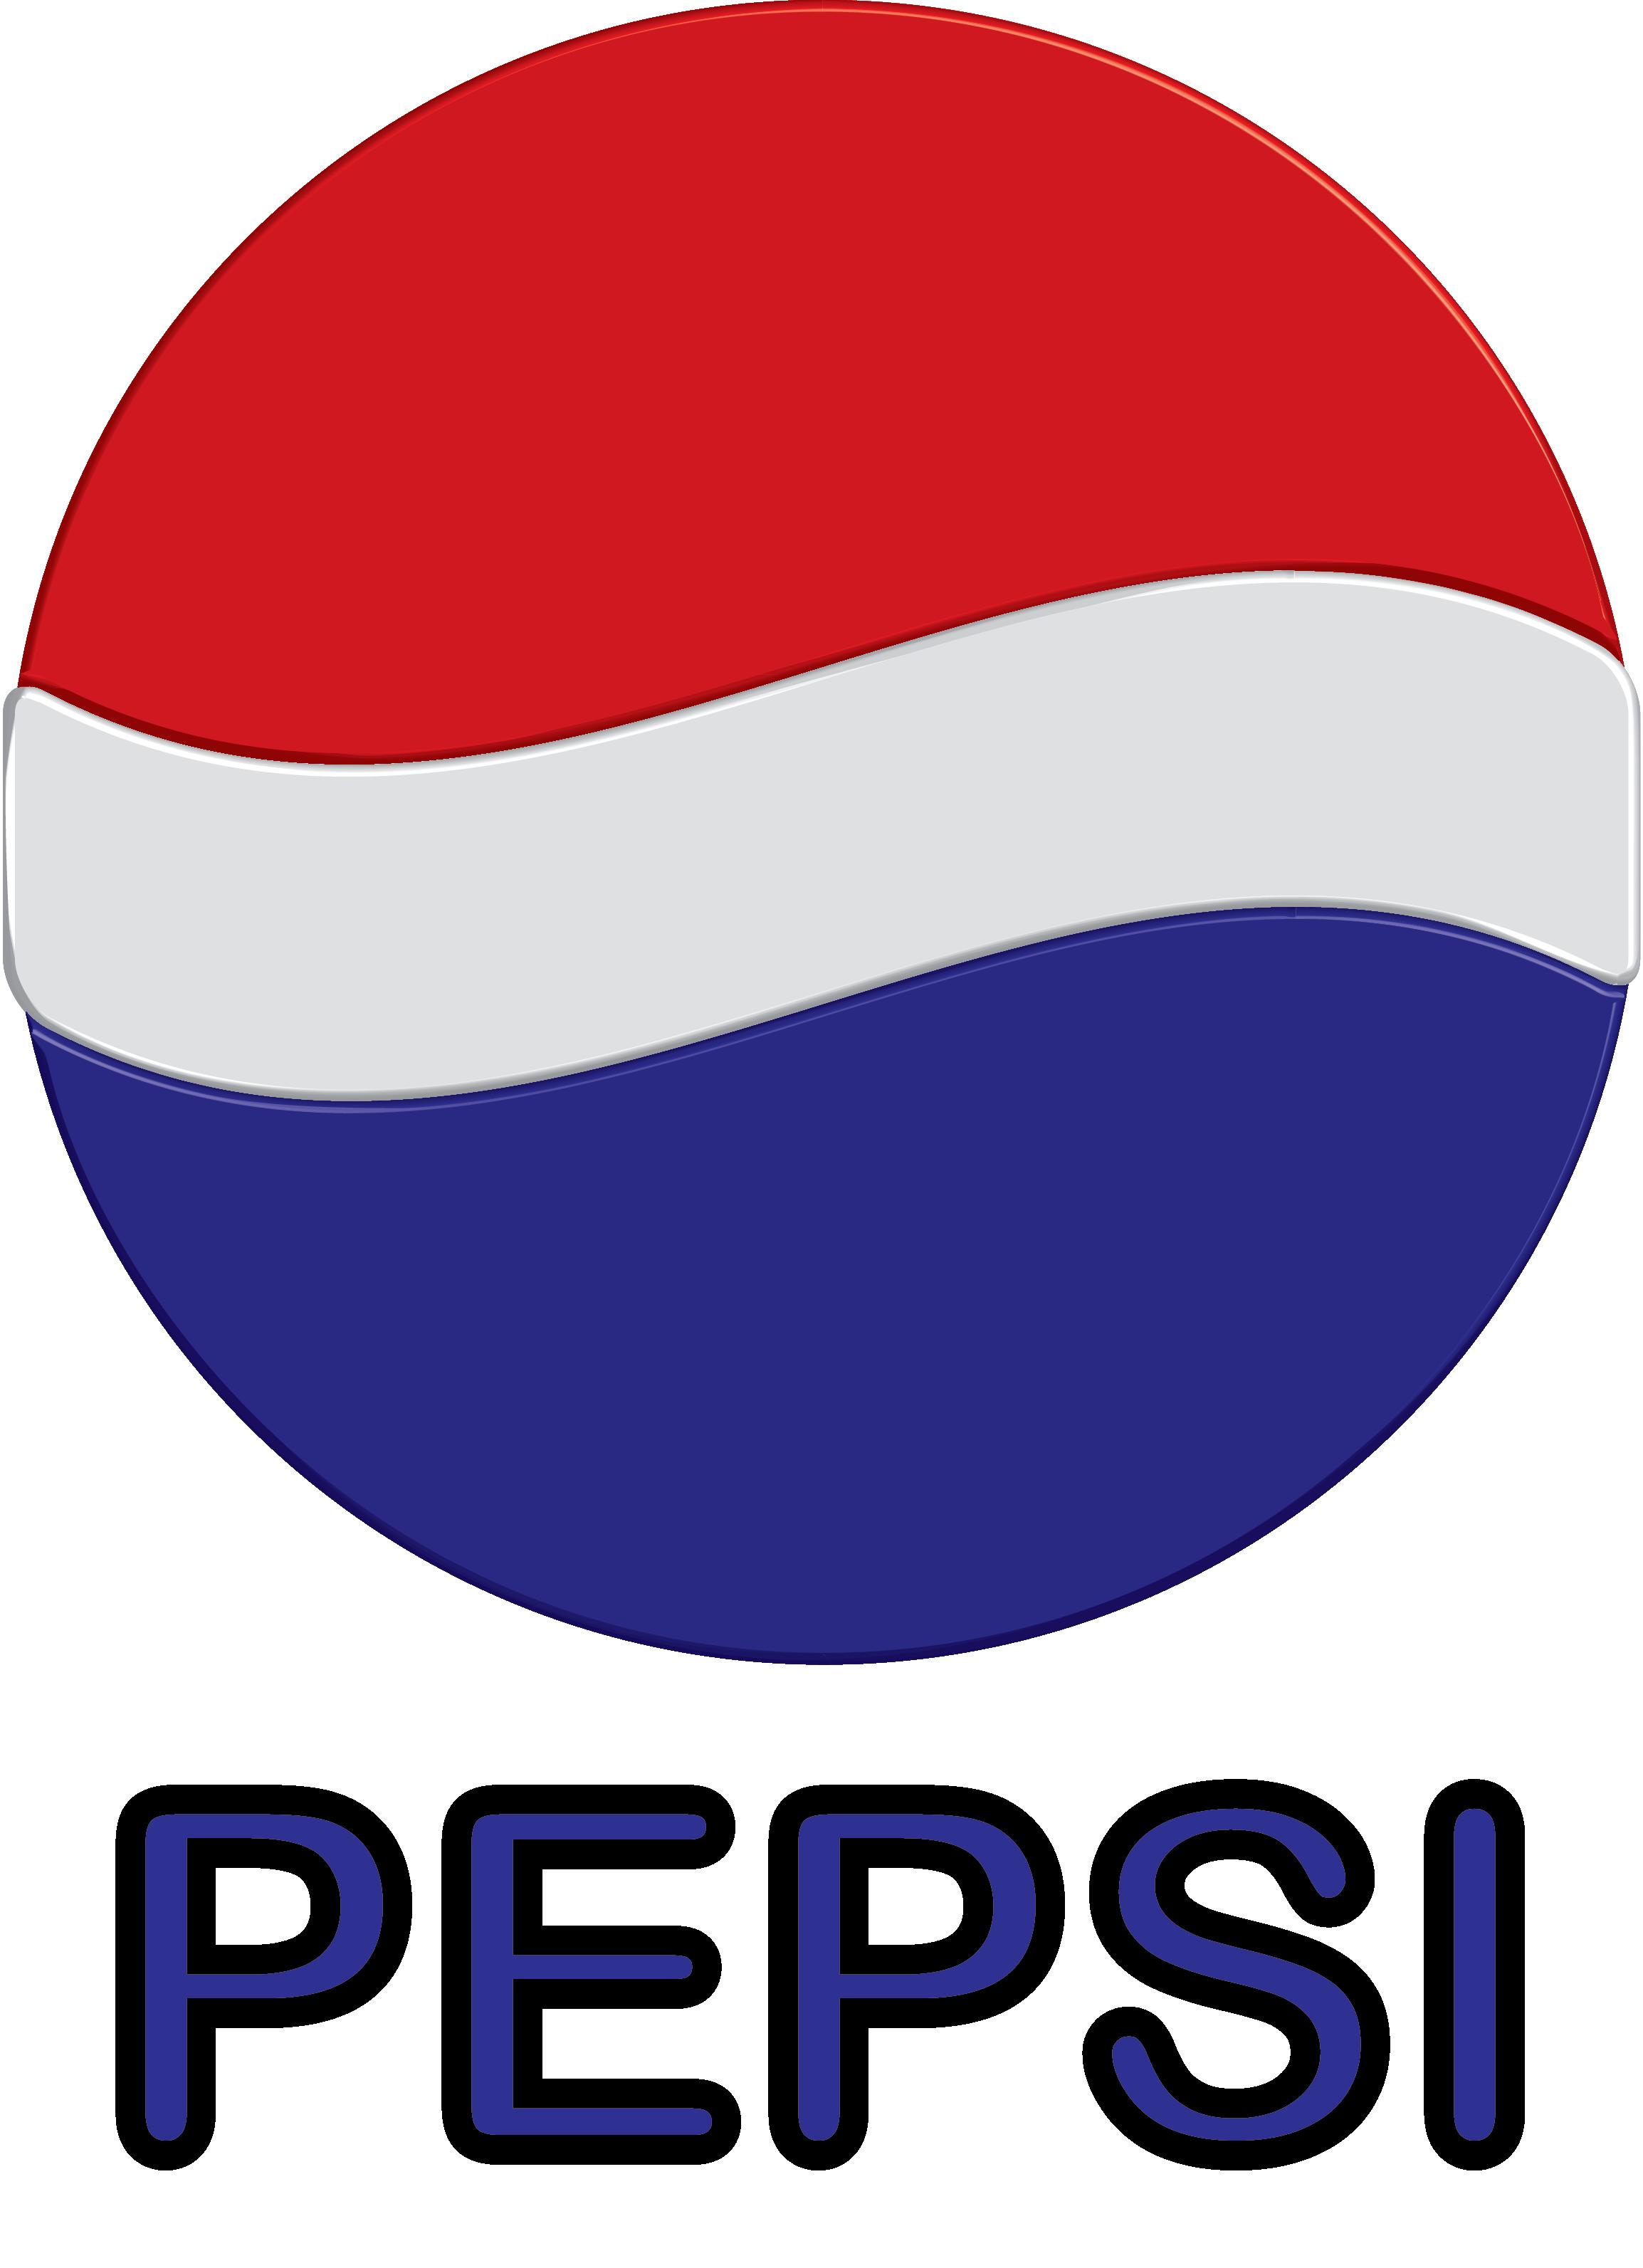 Pepsi Logo | Logo designs | Pepsi logo, Pepsi, Pepsi cola